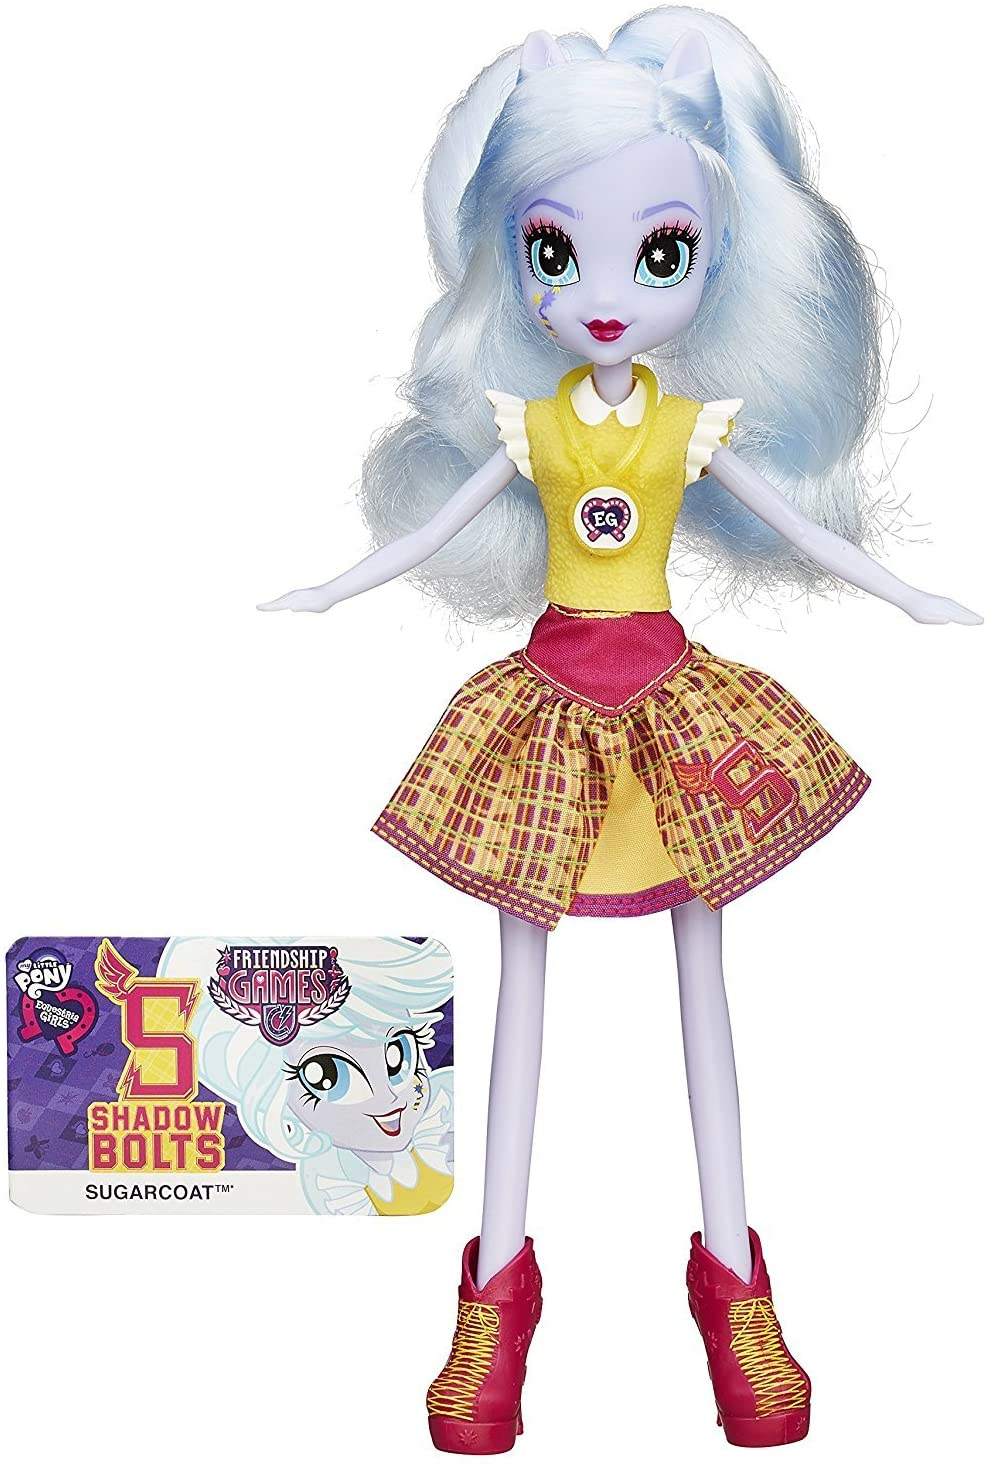 EG Friendship Games Sugarcoat Doll Figure 2